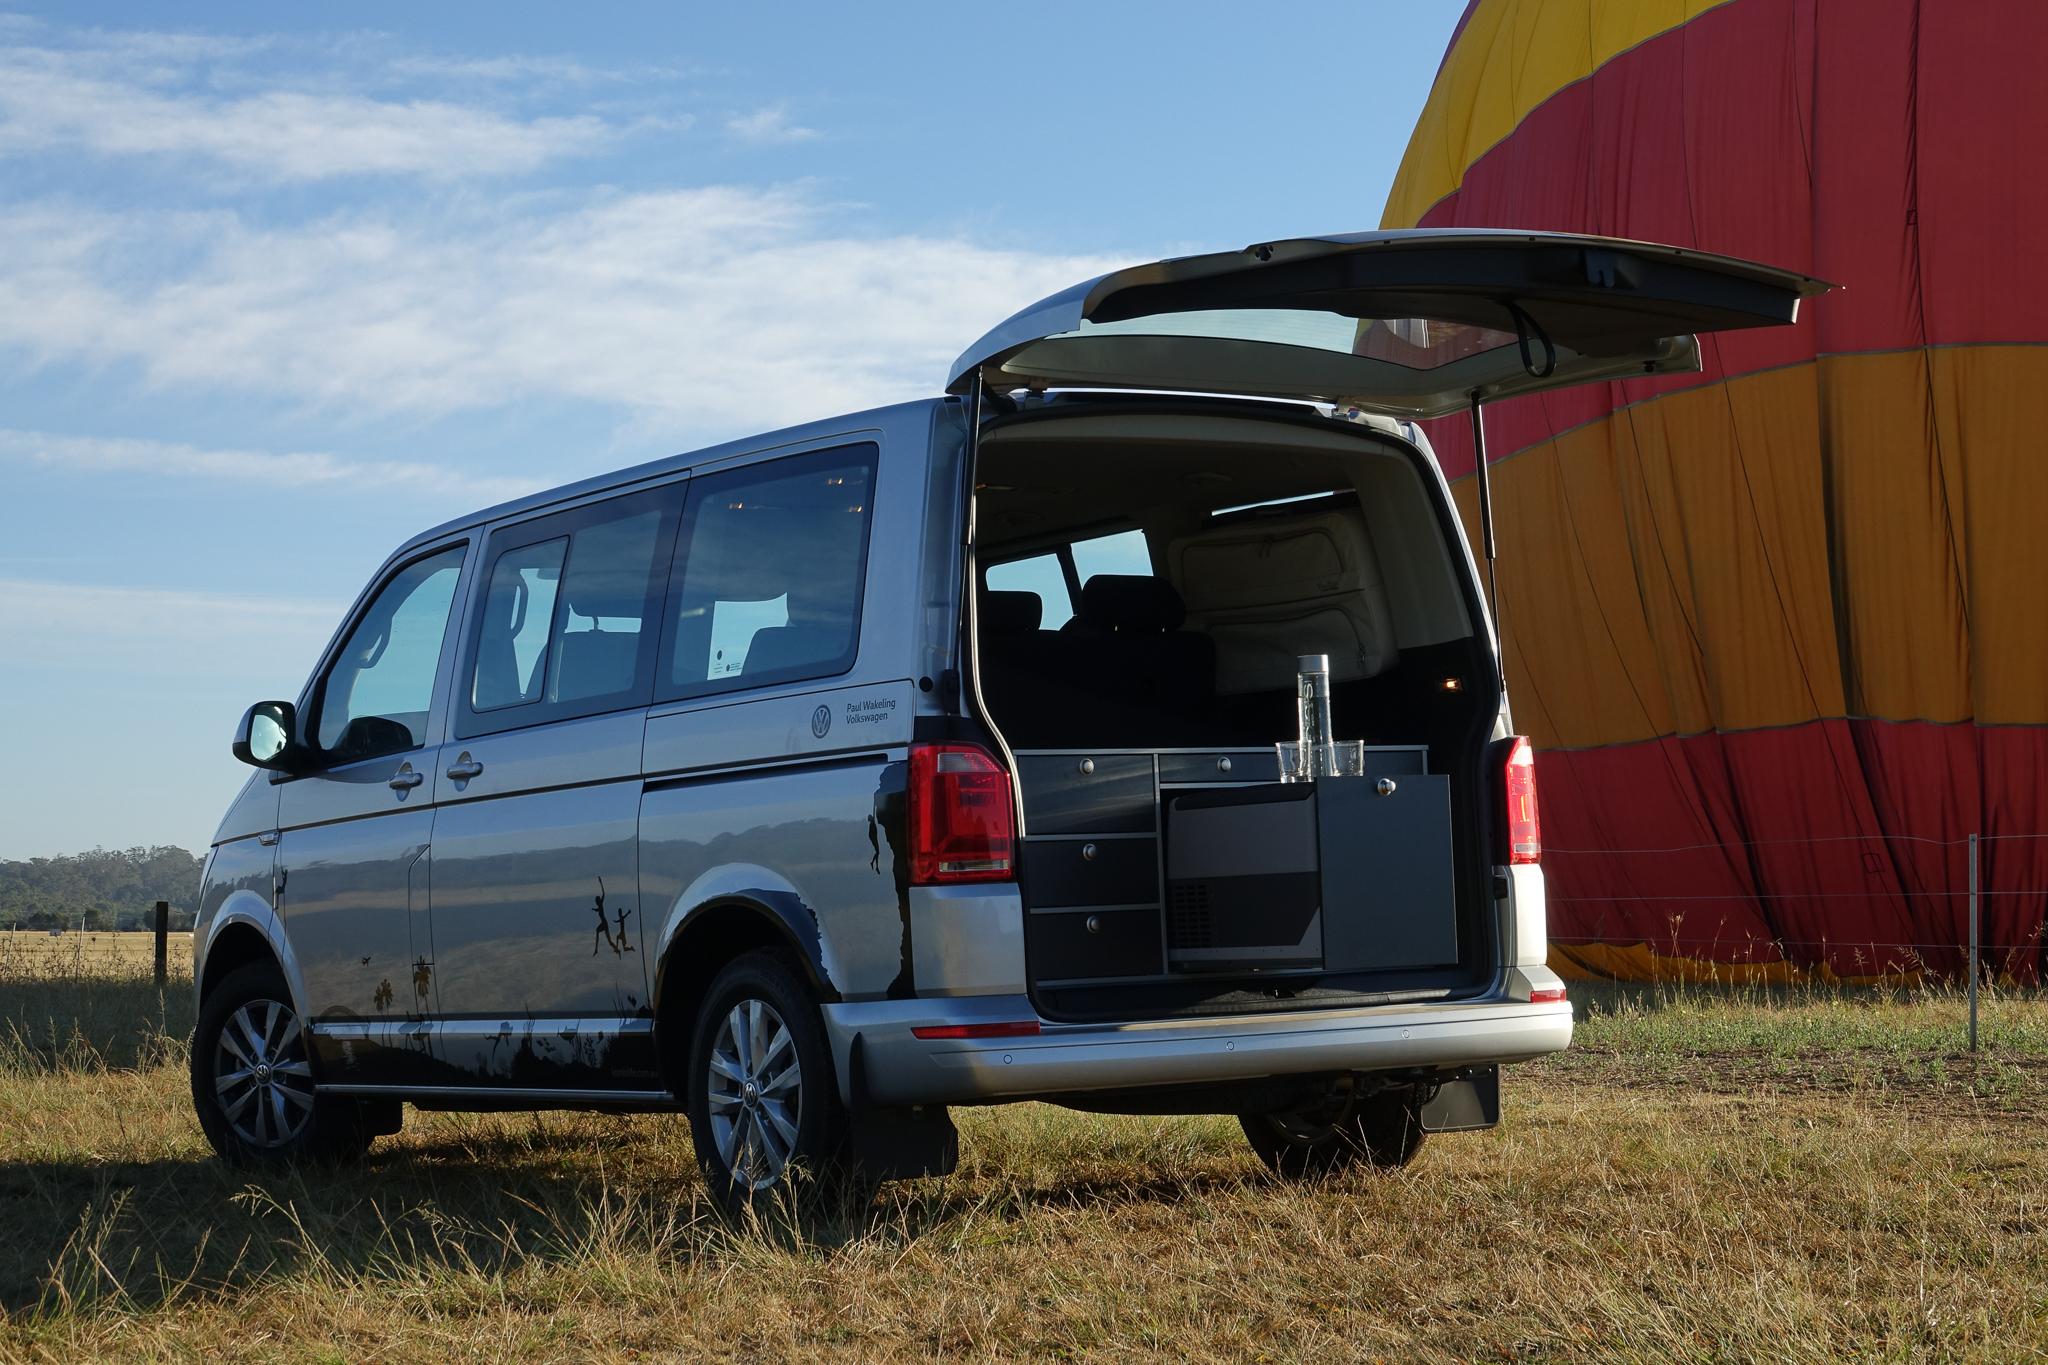 Modern-VW-T6-Campervan-2-Paul-Wakeling-Volkswagen-Kombilife-2.jpg